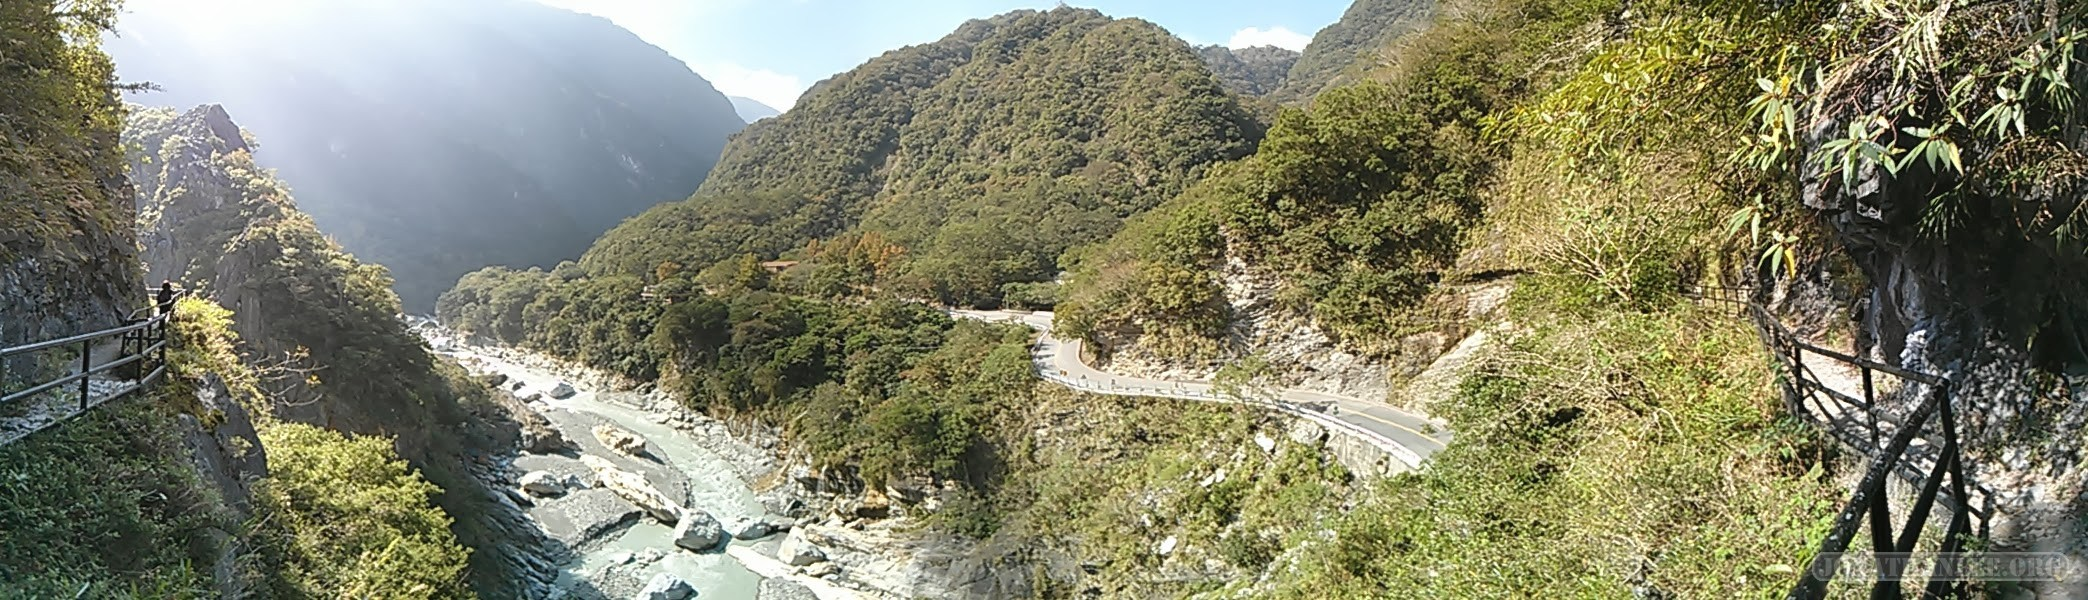 Hualien - Taroko panorama 2